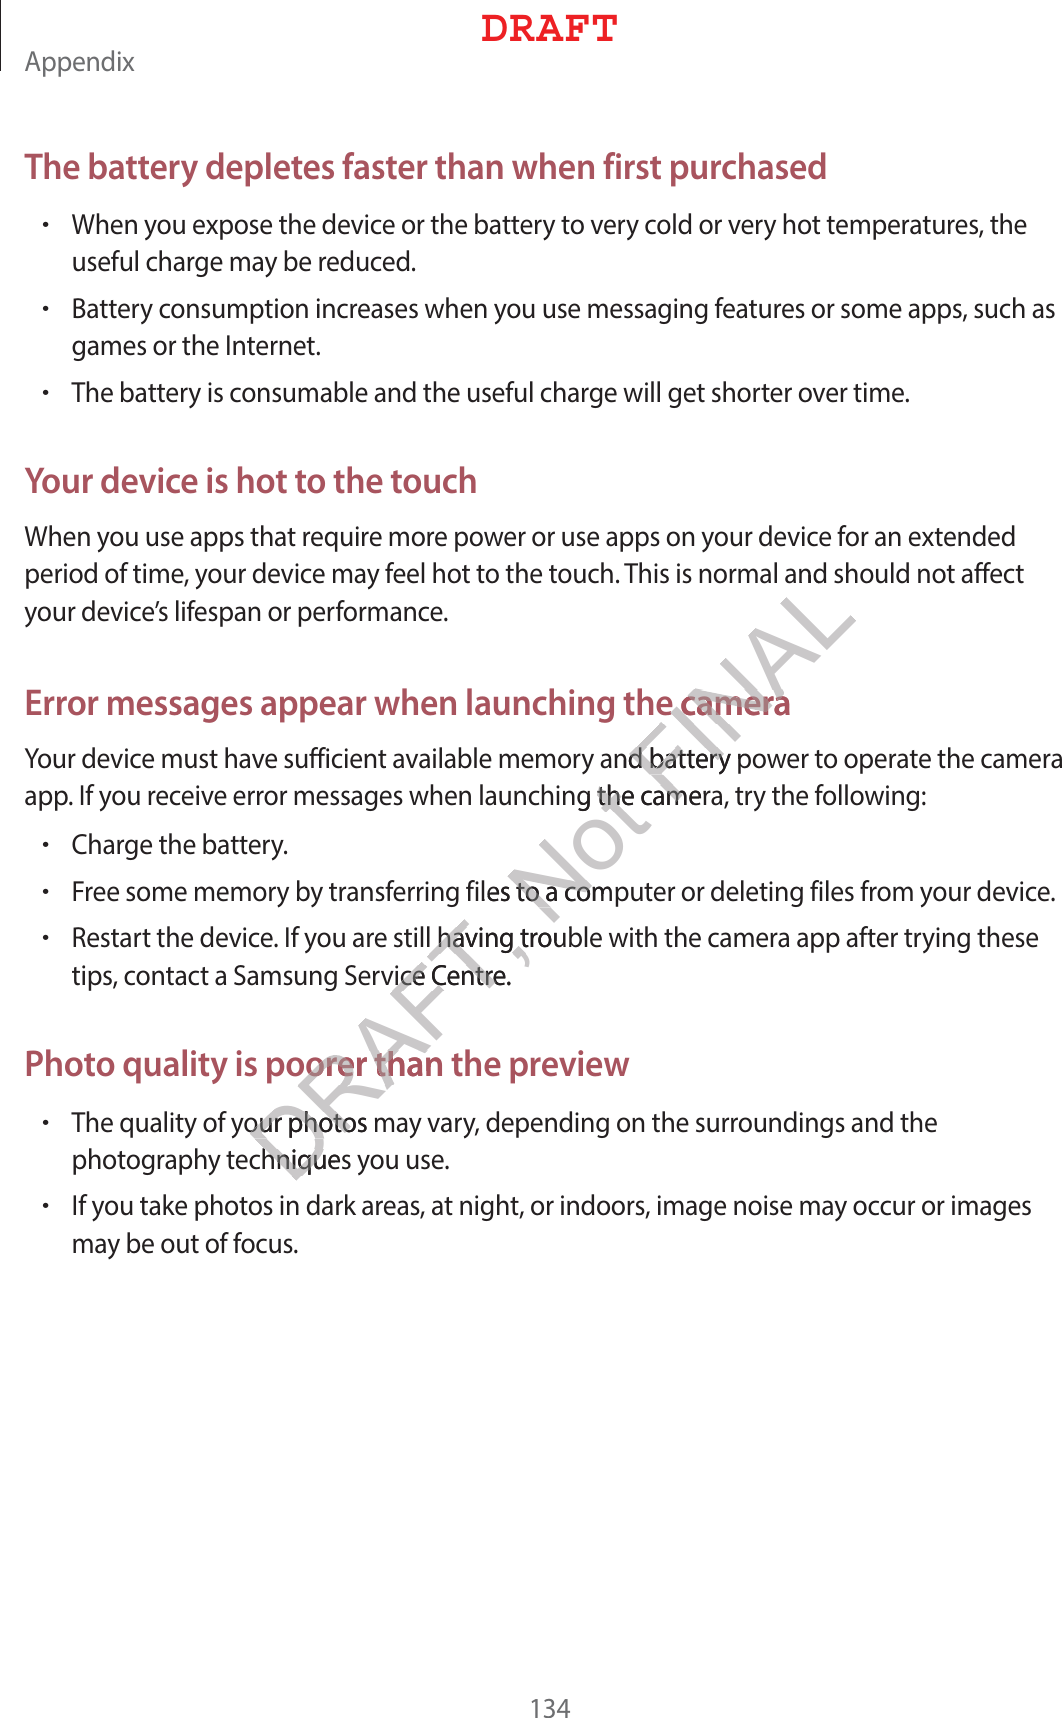 Samsung Electronics Co SCV35 Multi-band GSM/EDGE/UMTS/LTE